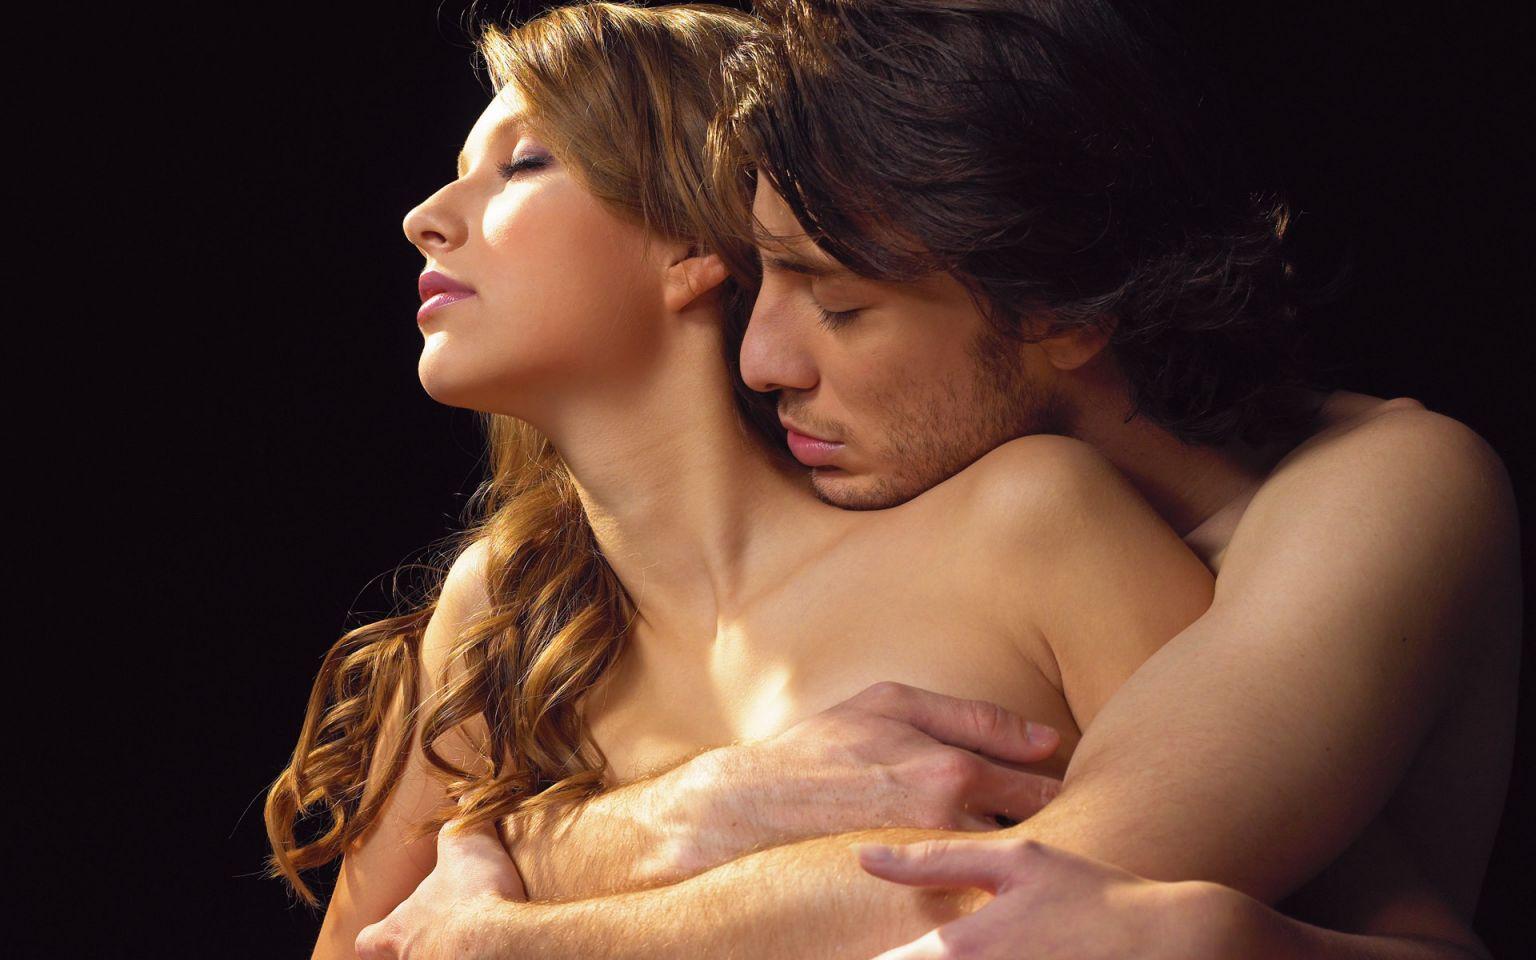 Видео романтика и секс это